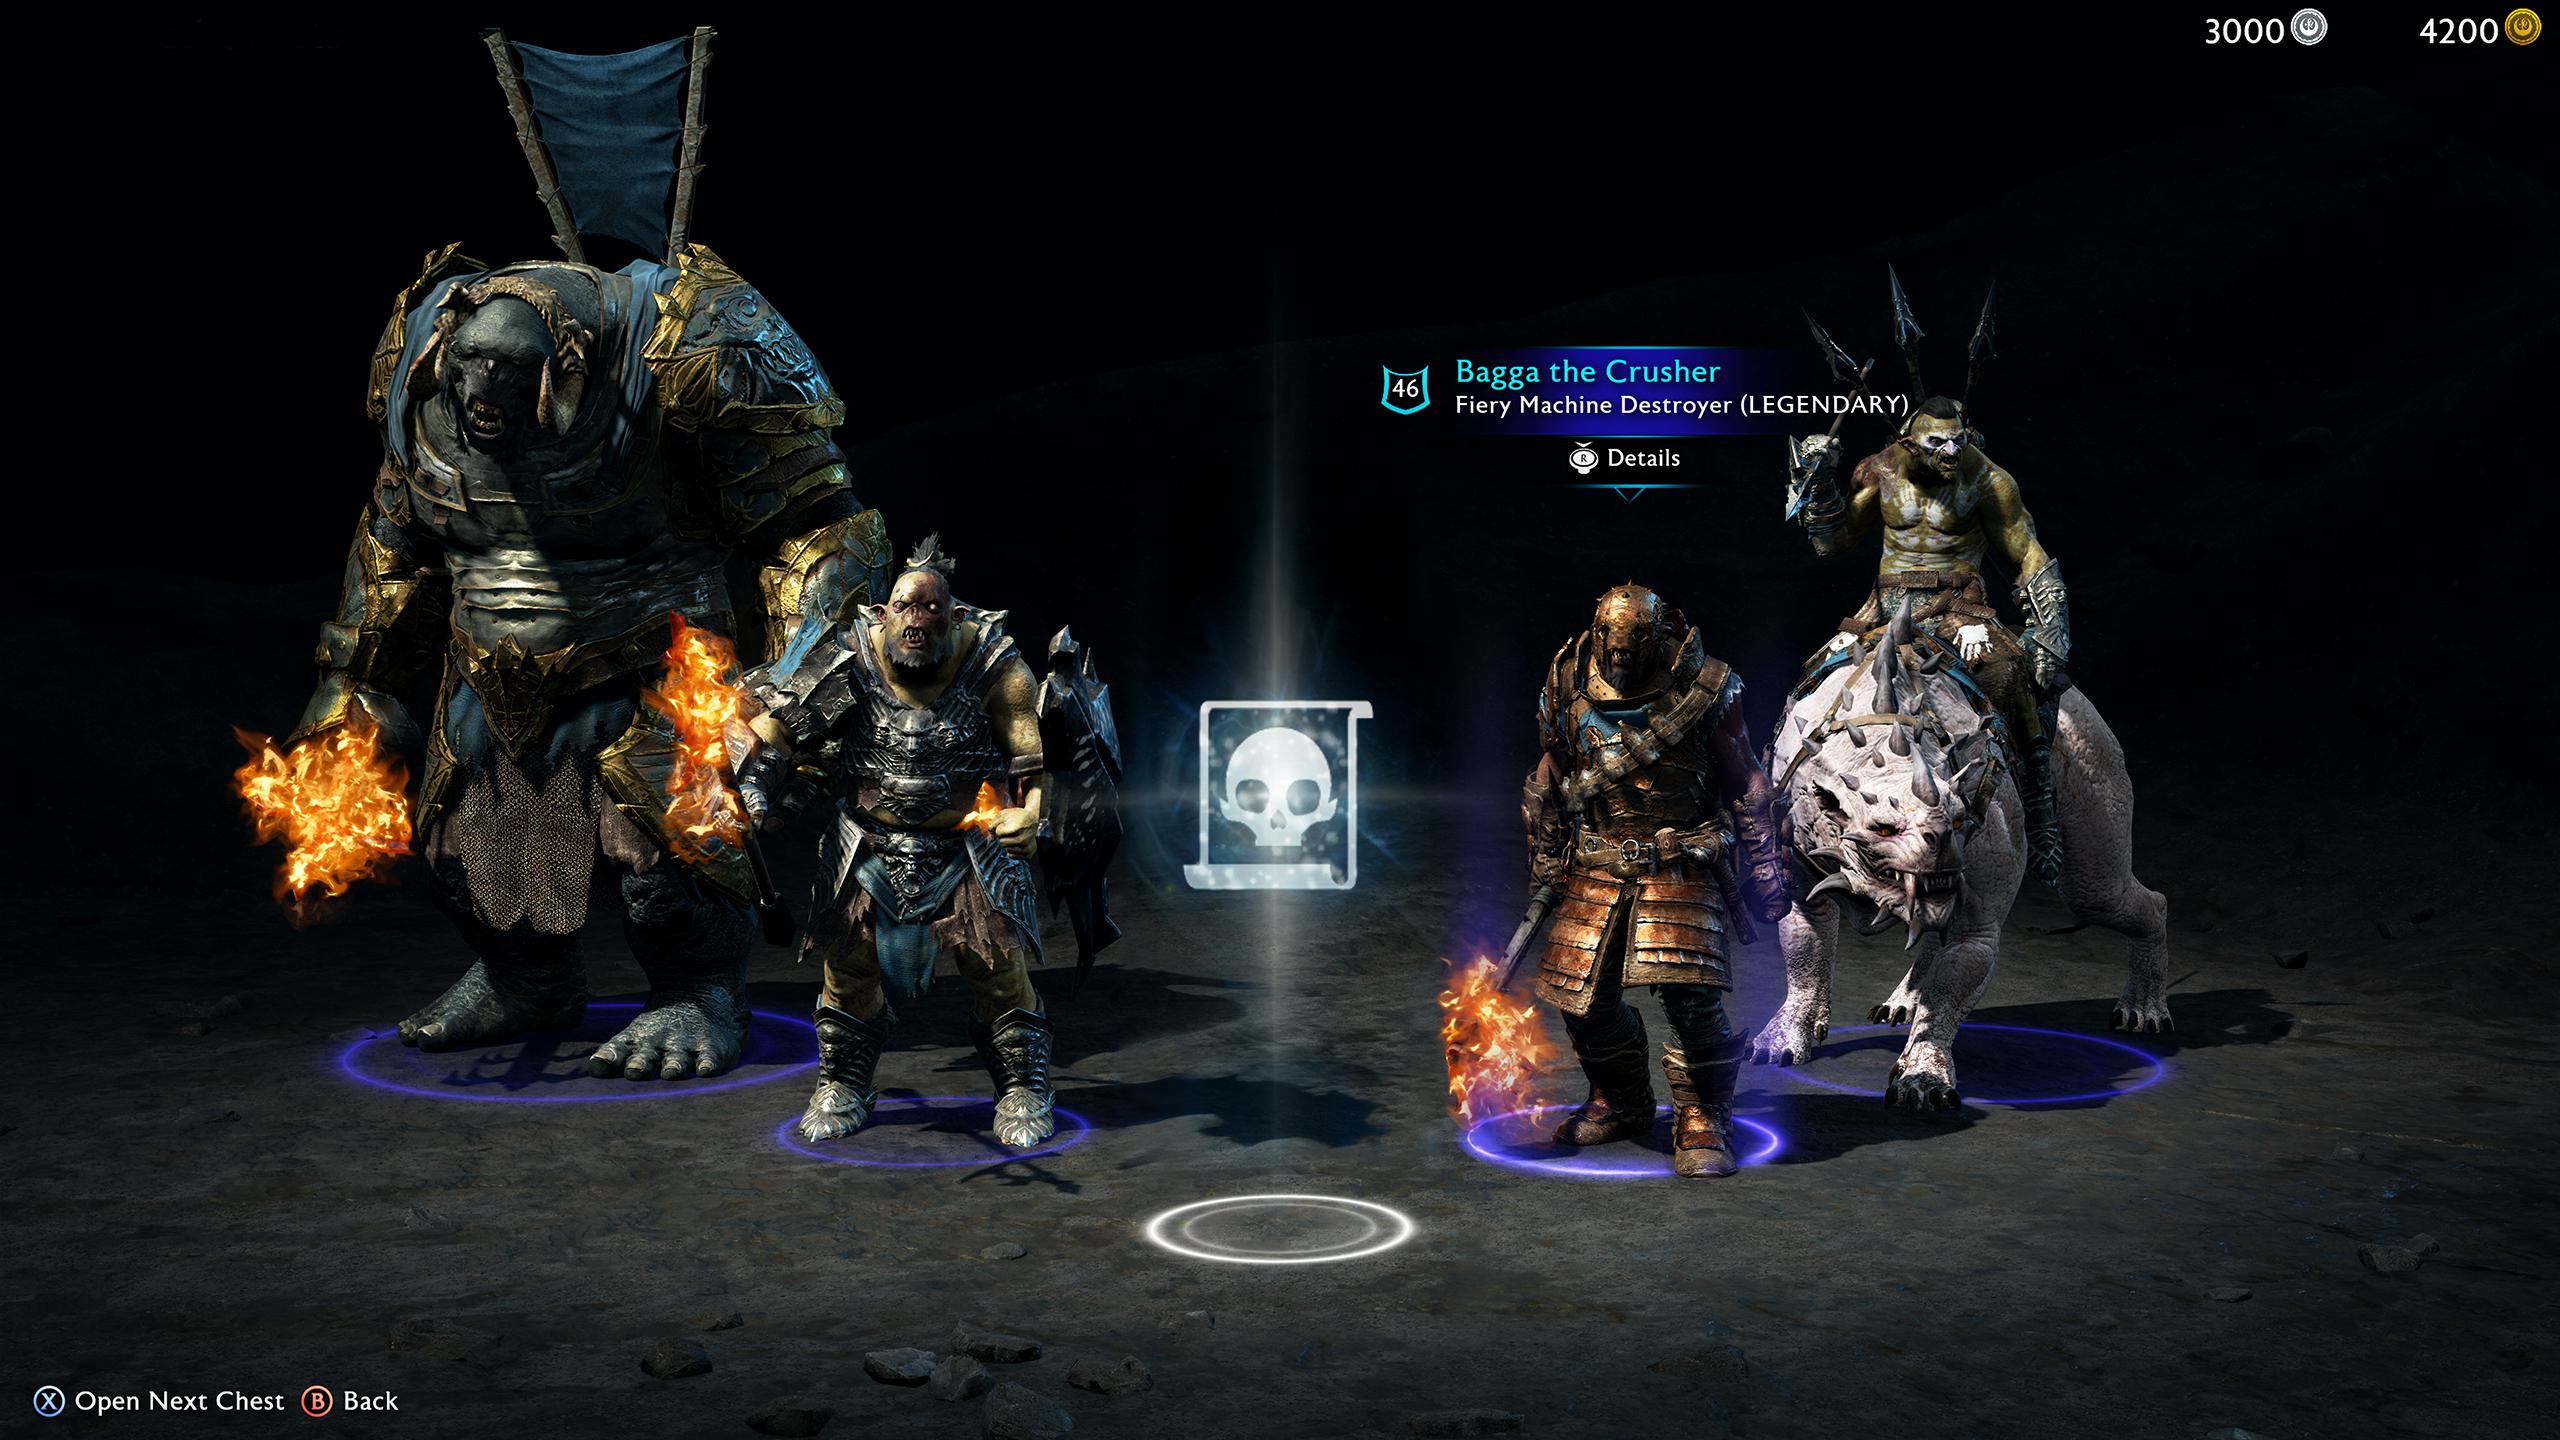 Микротранзакции в Middle-earth: Shadow of War